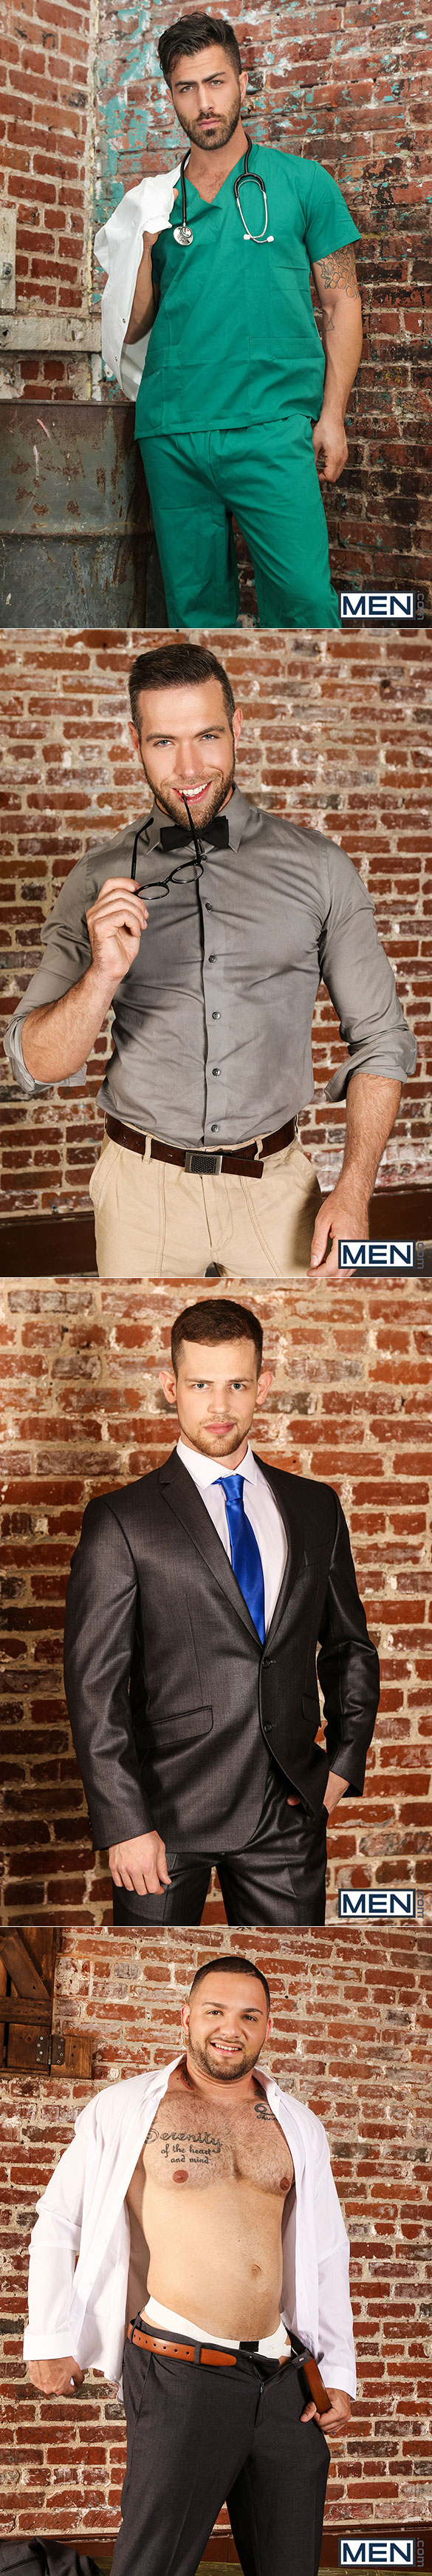 "Men.com: Adam Ramzi and Kurtis Wolfe fuck Alex Mecum and Julian Knowles in ""Dangerous Days, Part 3"""